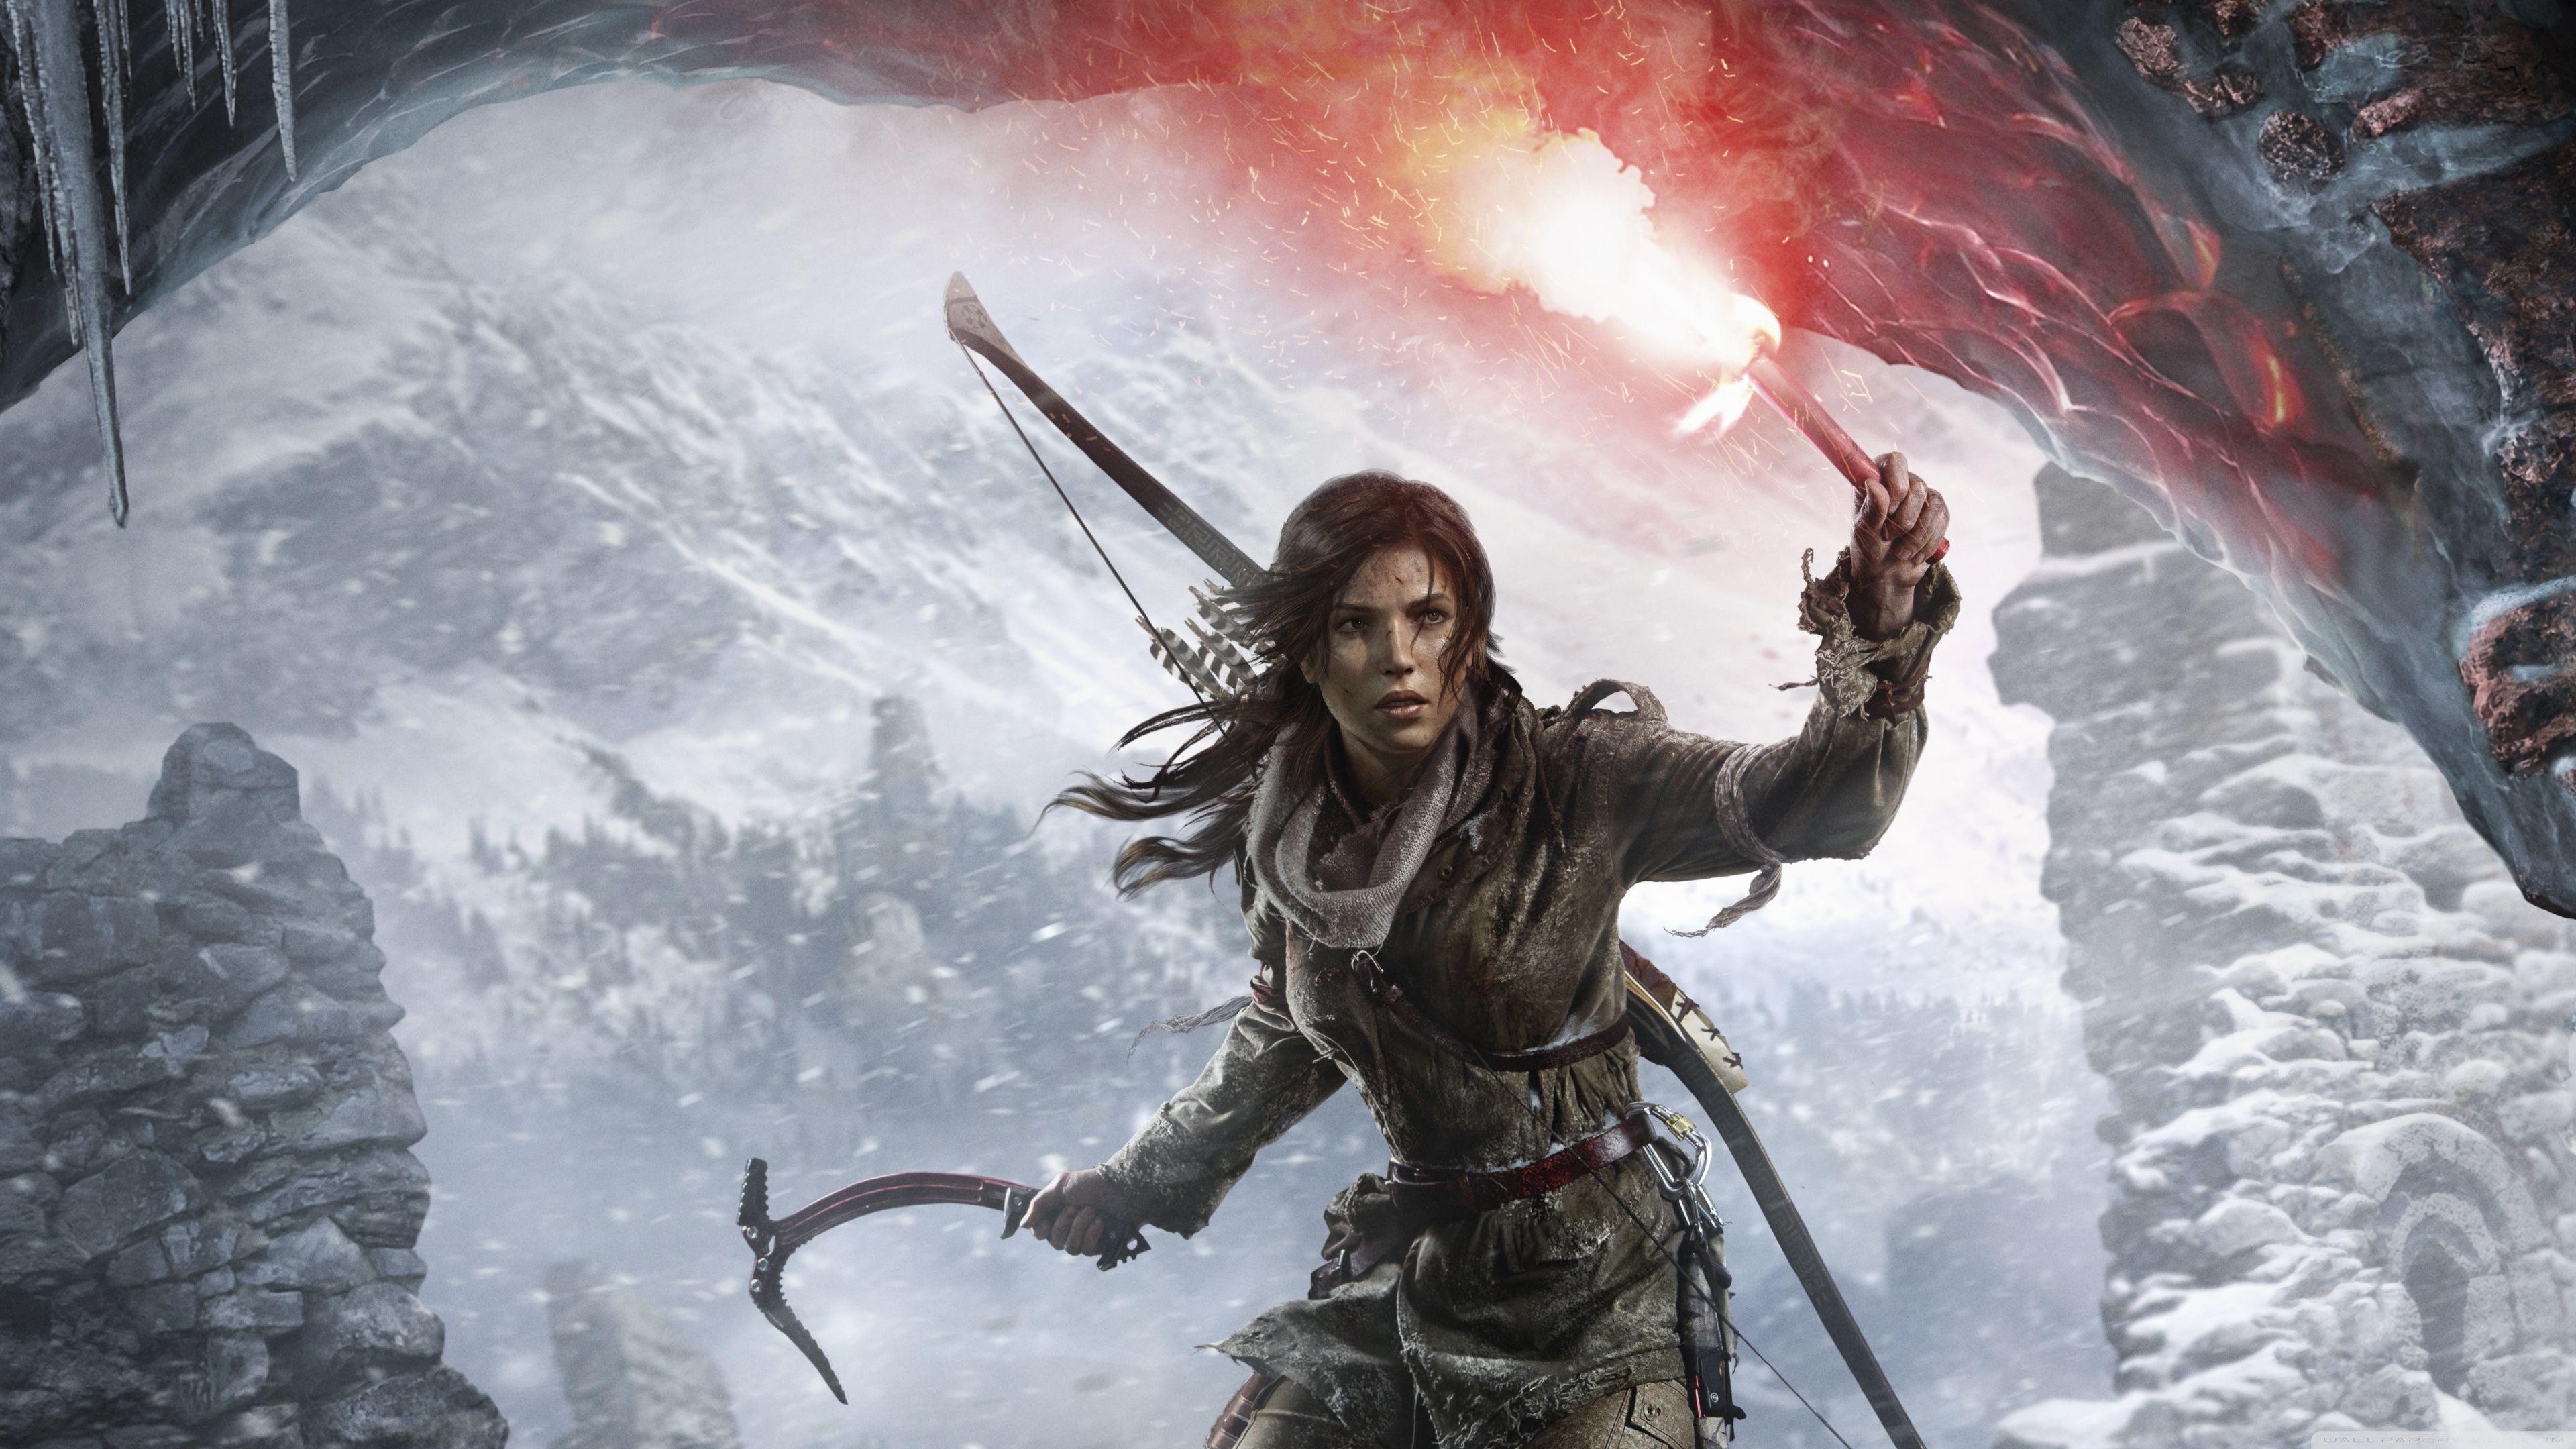 Tomb Raider 4k Desktop Wallpapers Top Free Tomb Raider 4k